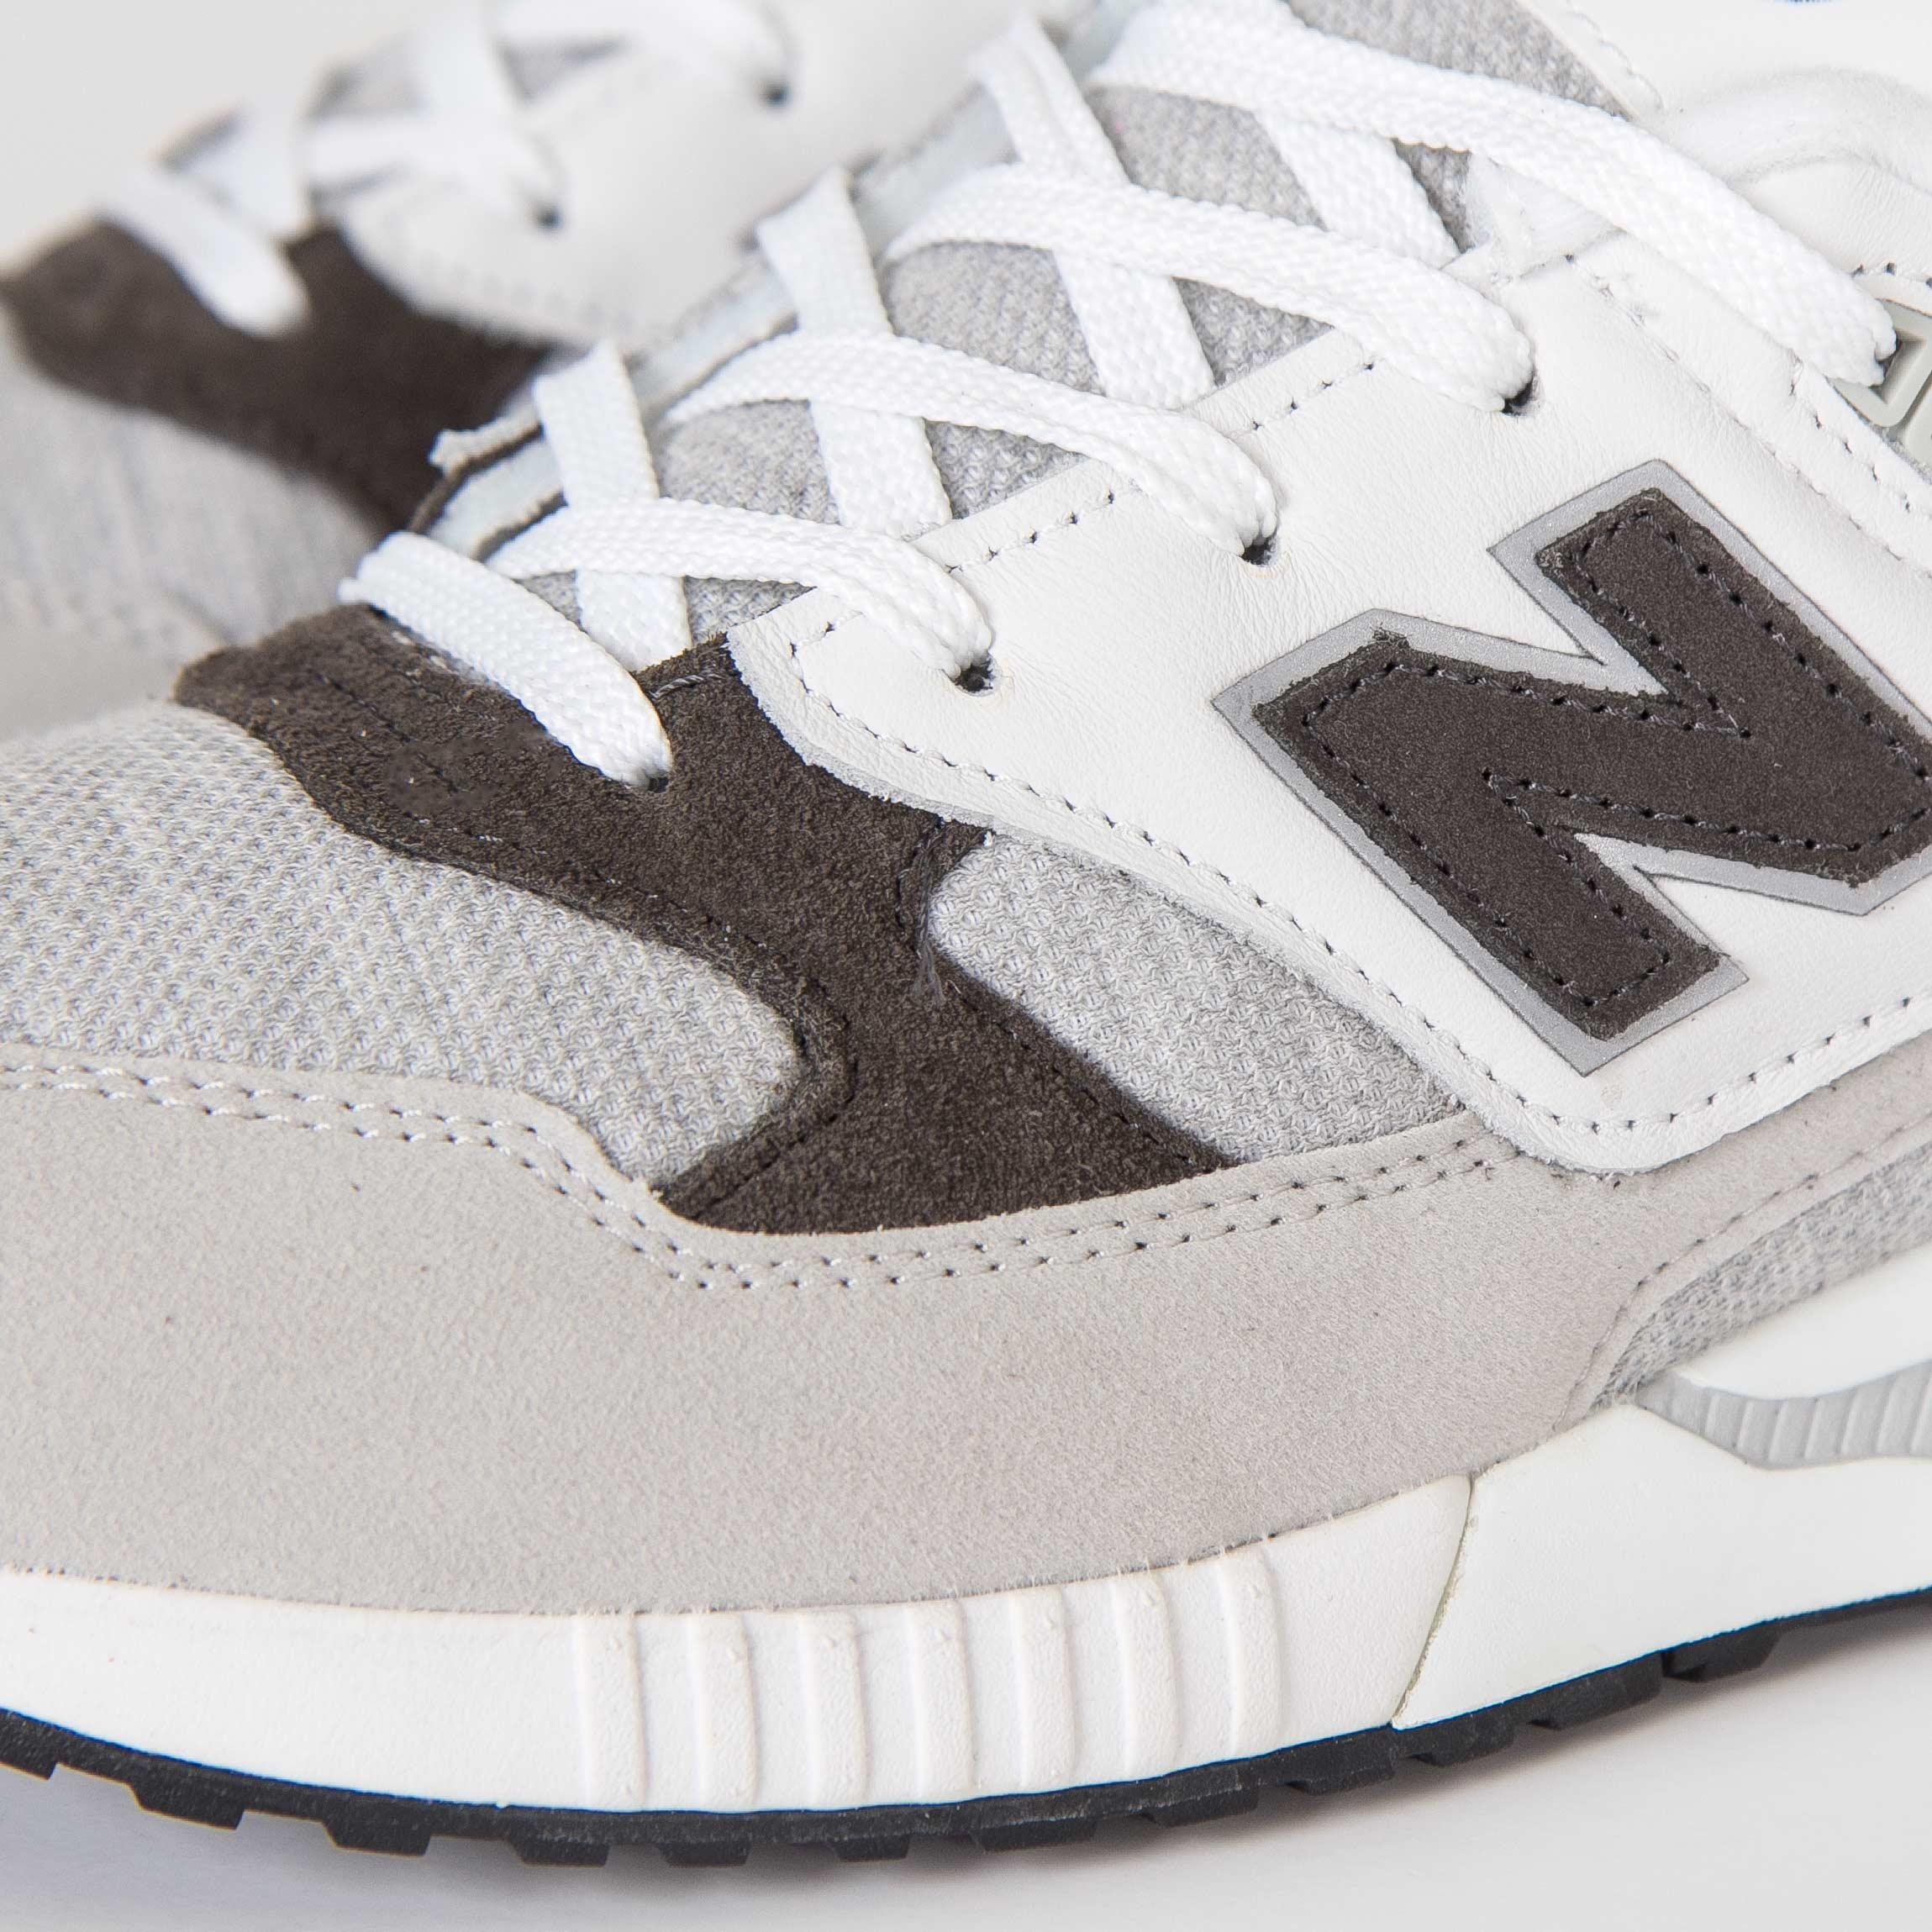 New Balance M530 - M530ccr - SNS | sneakers & streetwear online ...